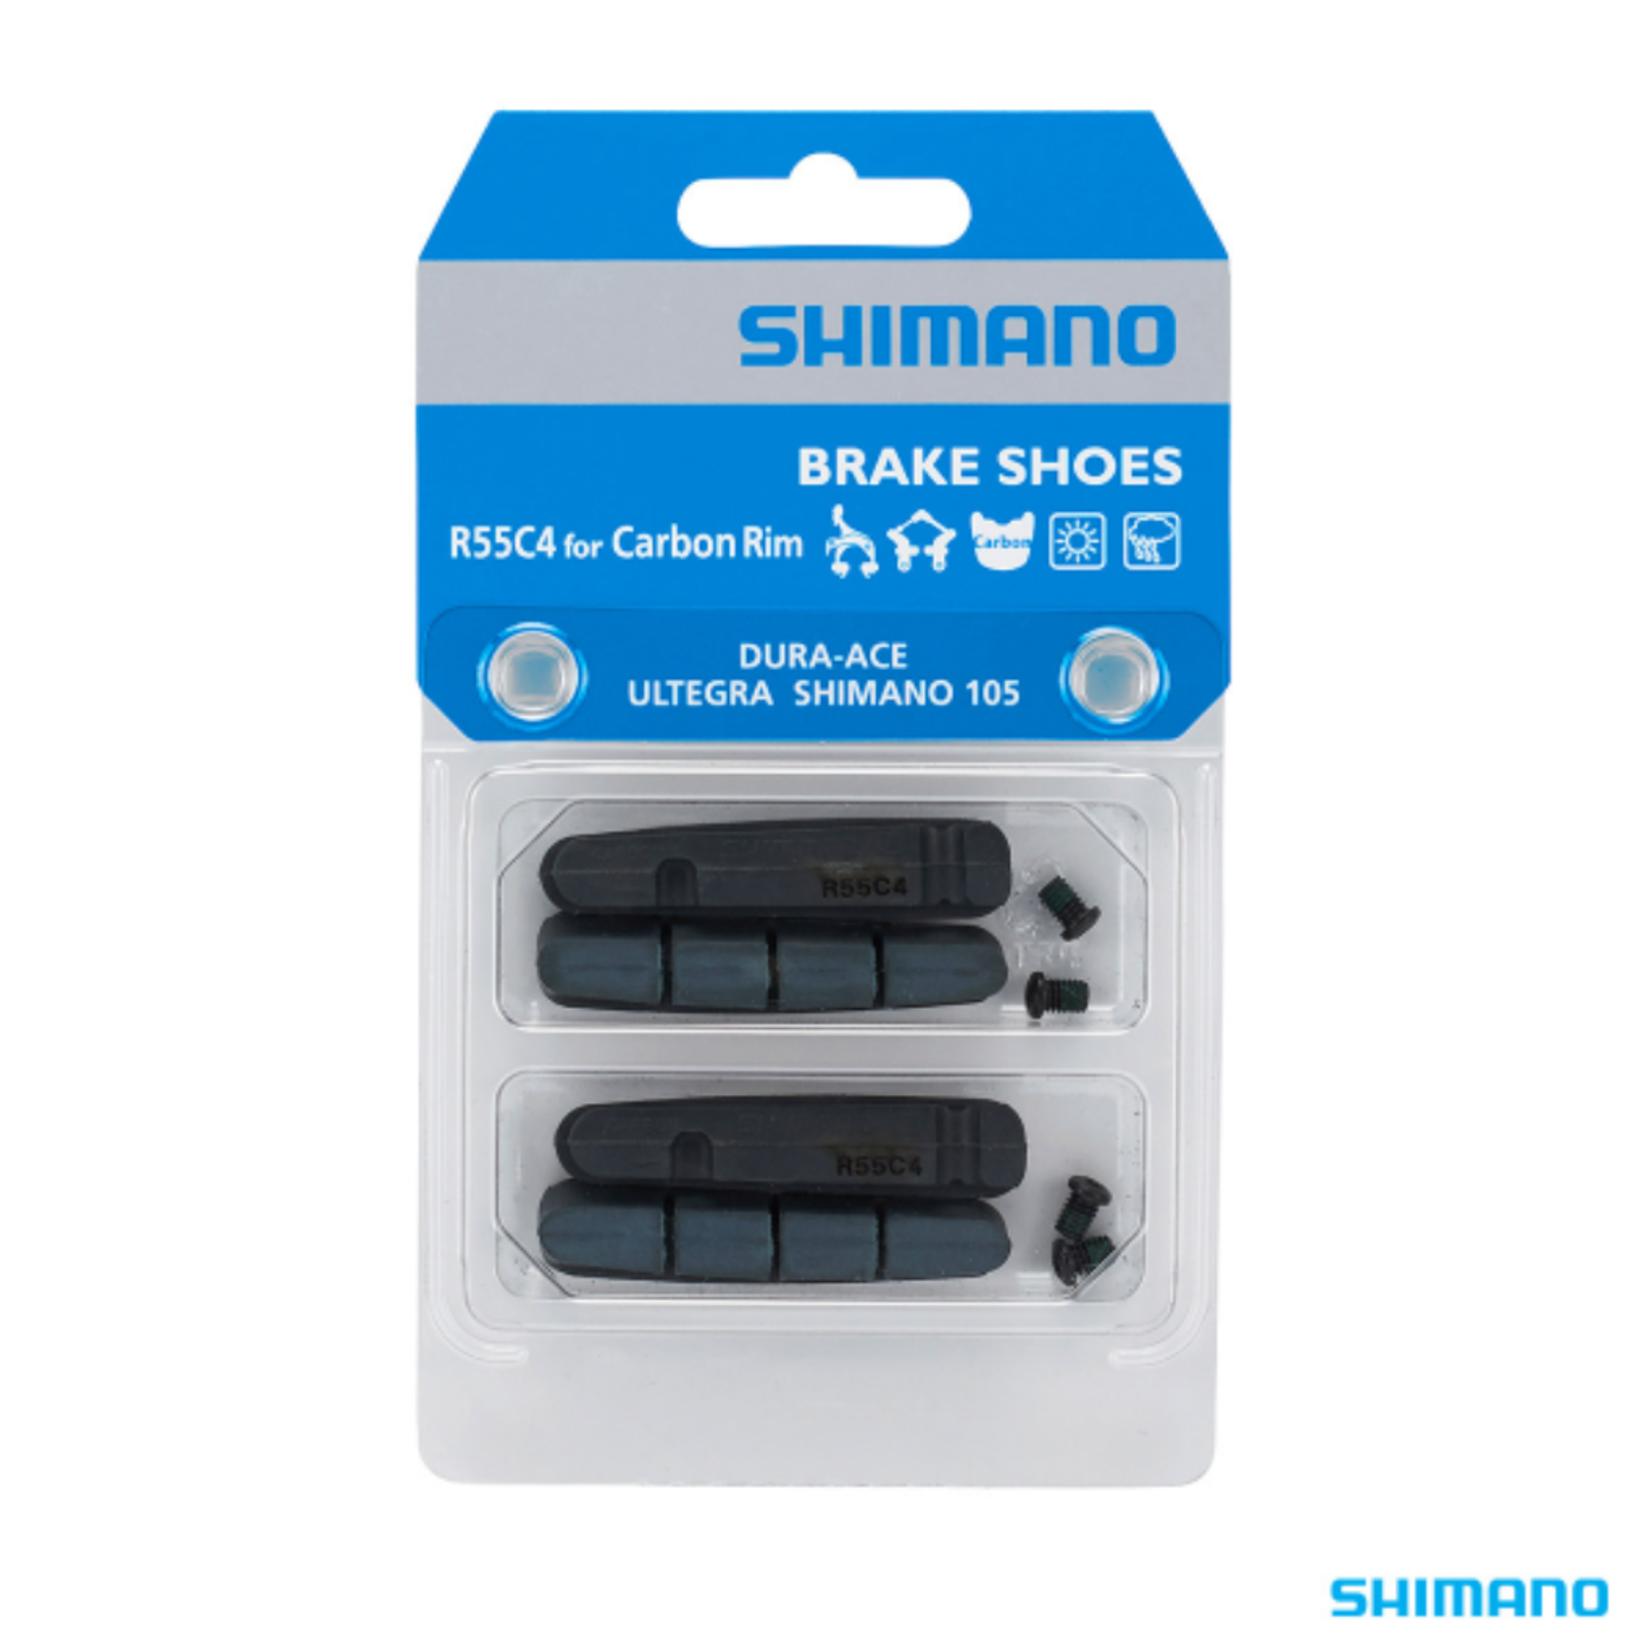 Shimano Shimano, BR-9000 Brake Pad Inserts R55C4 For Carbon Rim (2 Pair)